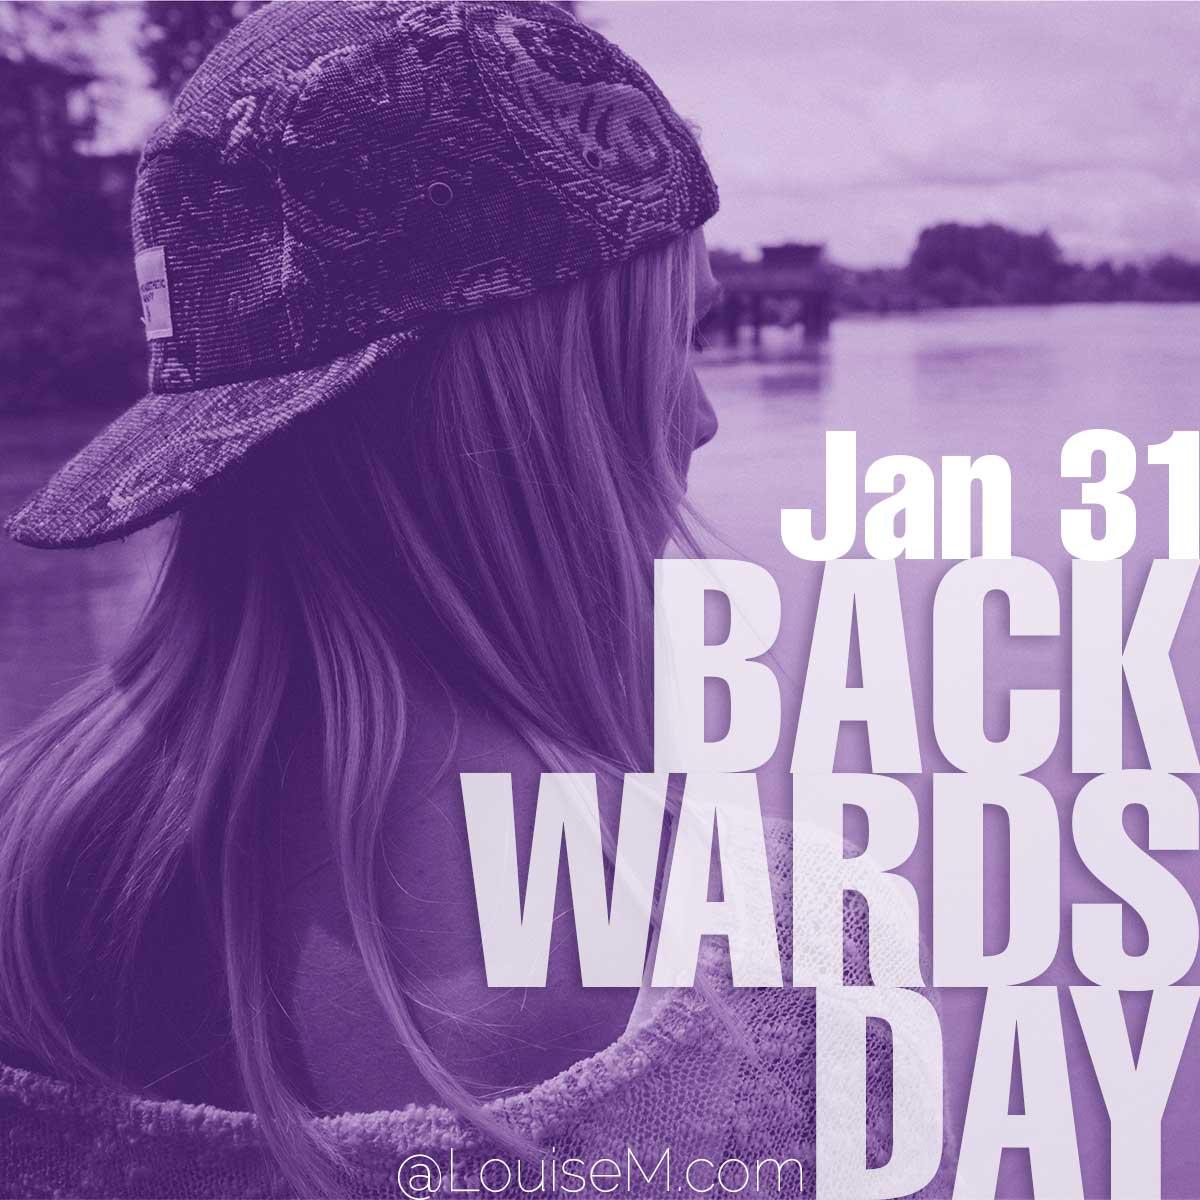 Backwards Daytext over photo of woman wearing cap backwards.